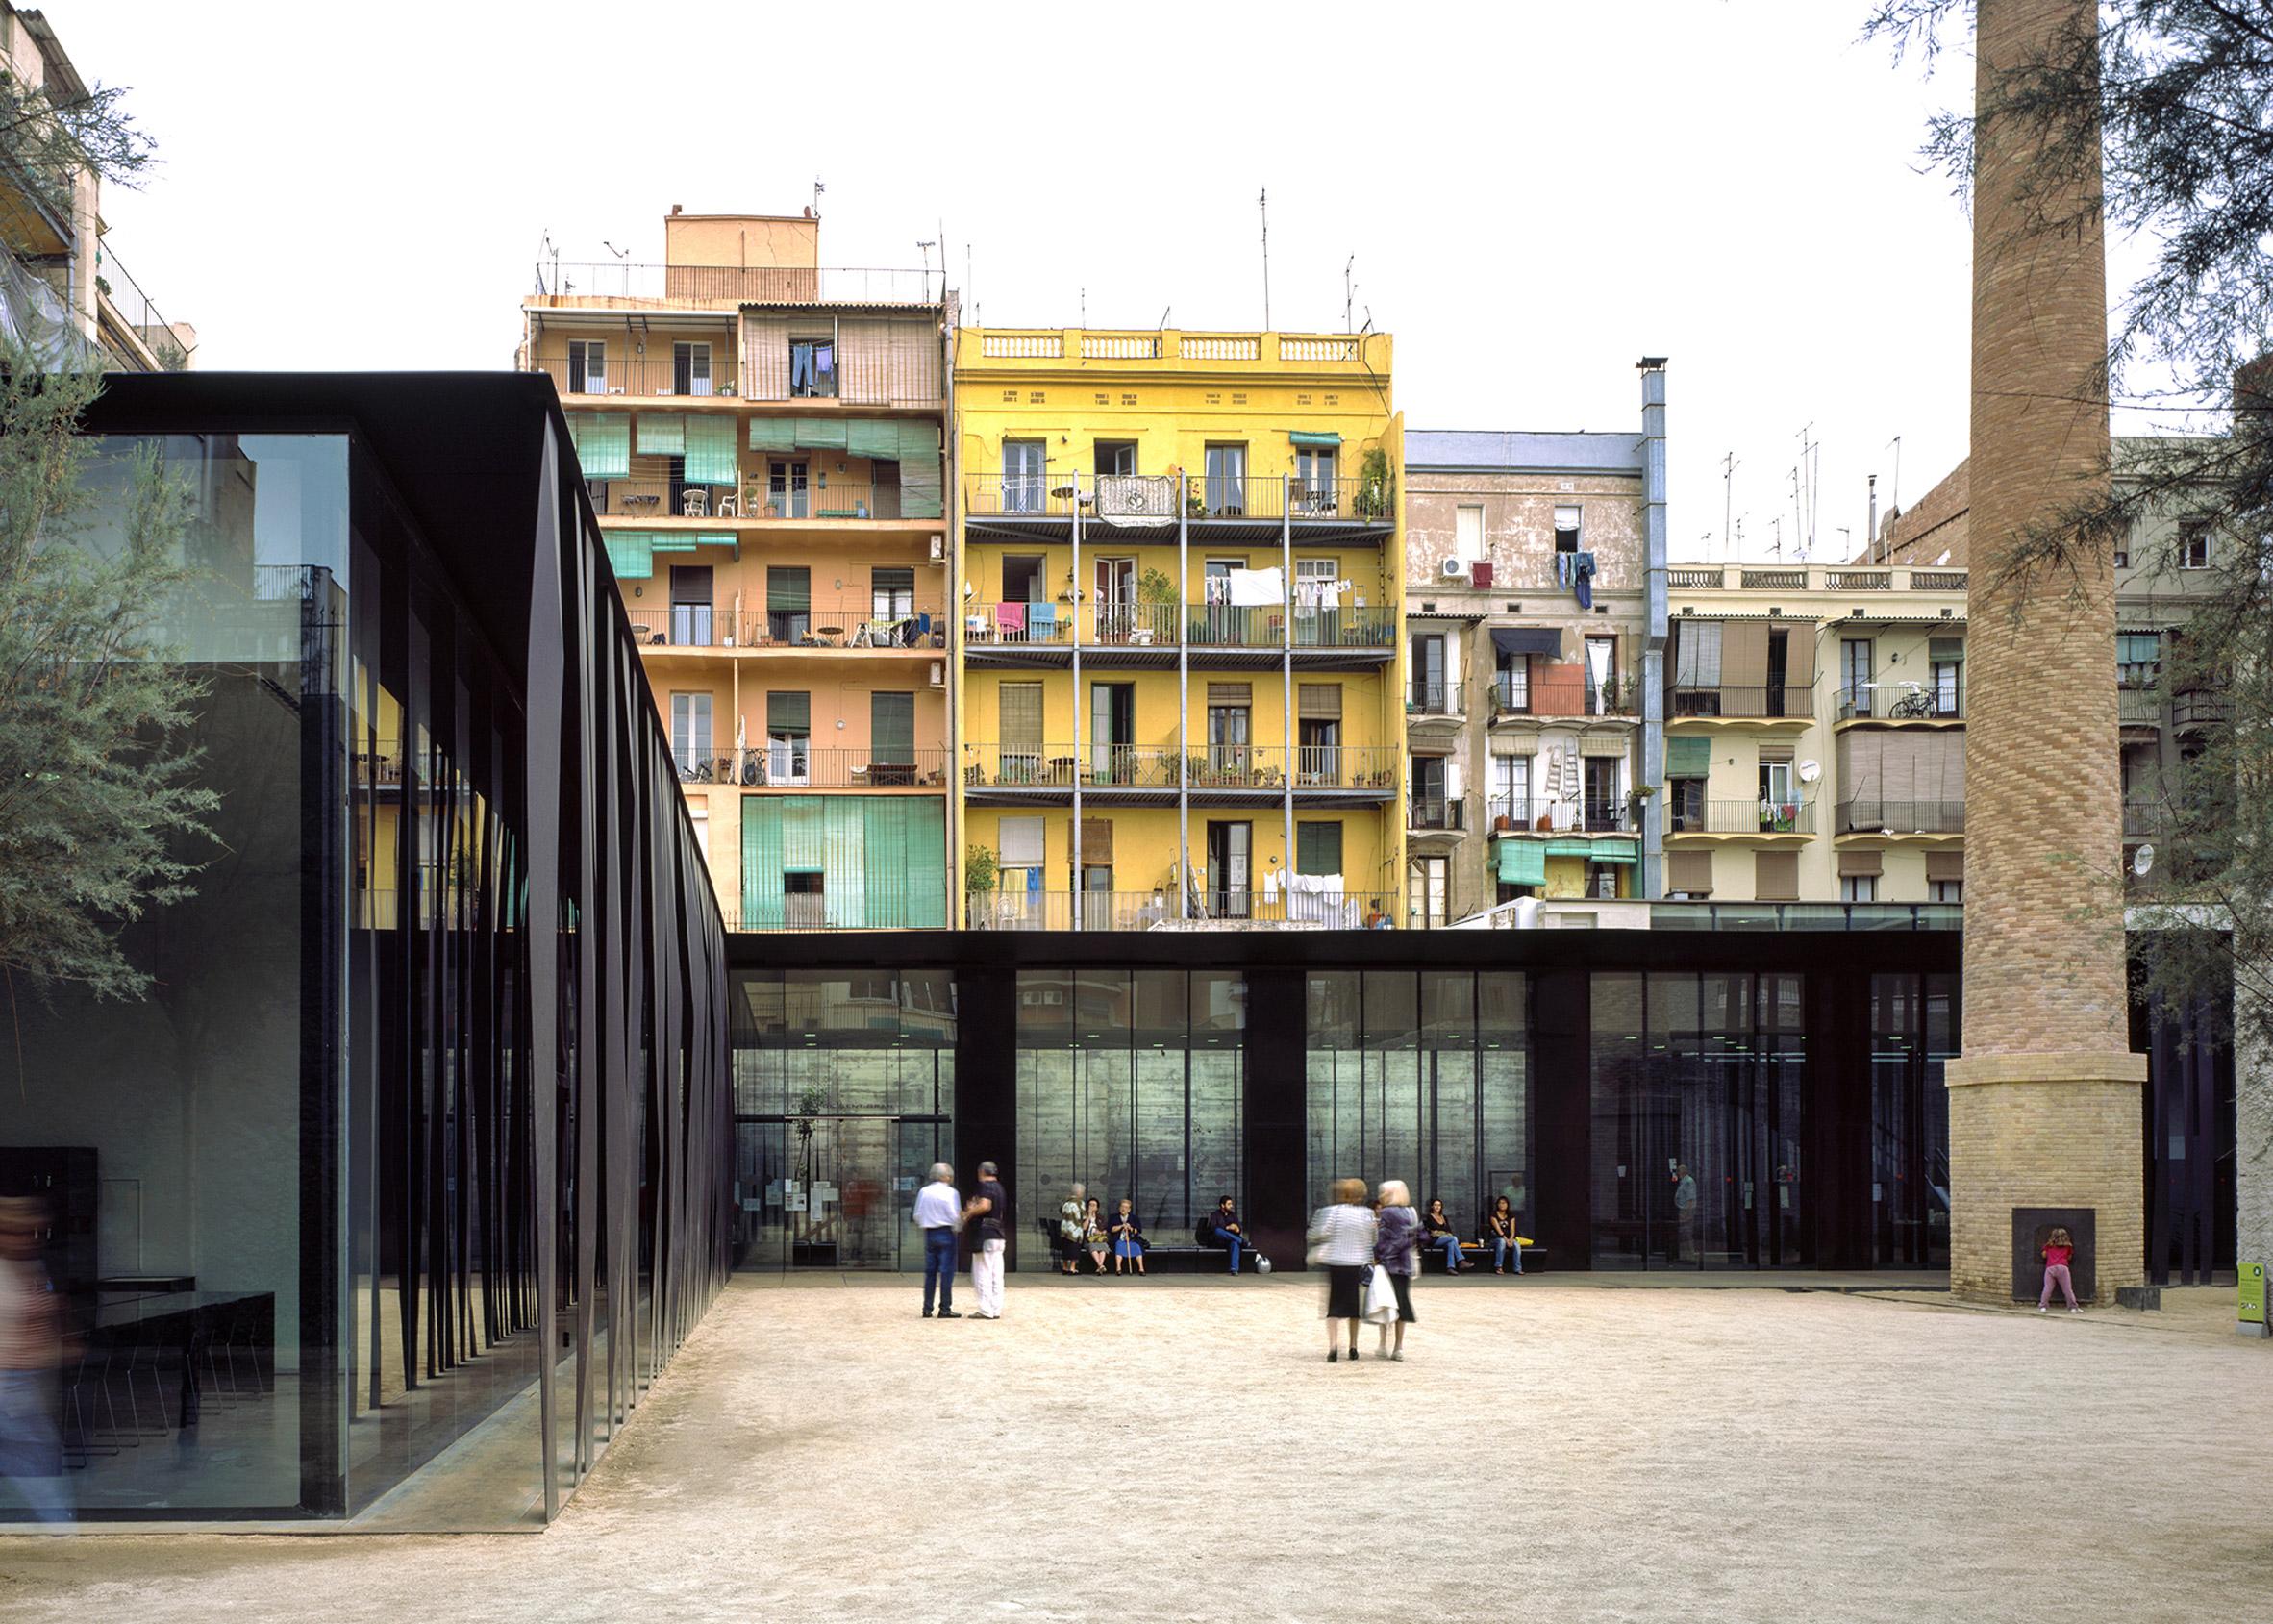 Sant Antoni – Joan Oliver Library, Senior Citizens Center and Cándida Pérez Gardens, 2007, Barcelona, Spain